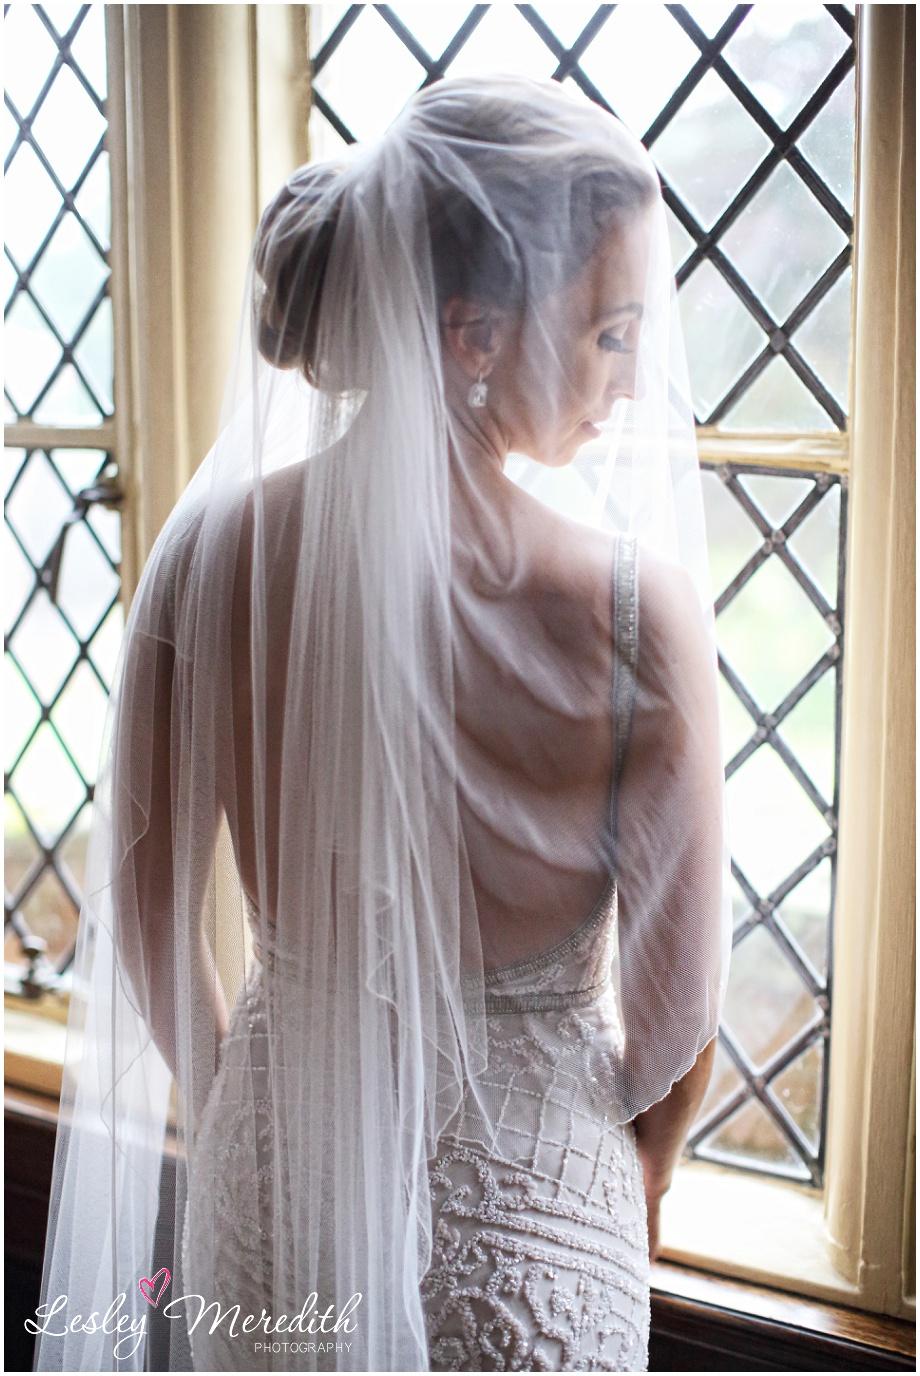 Lesley Meredith Photoghraphy  (23)